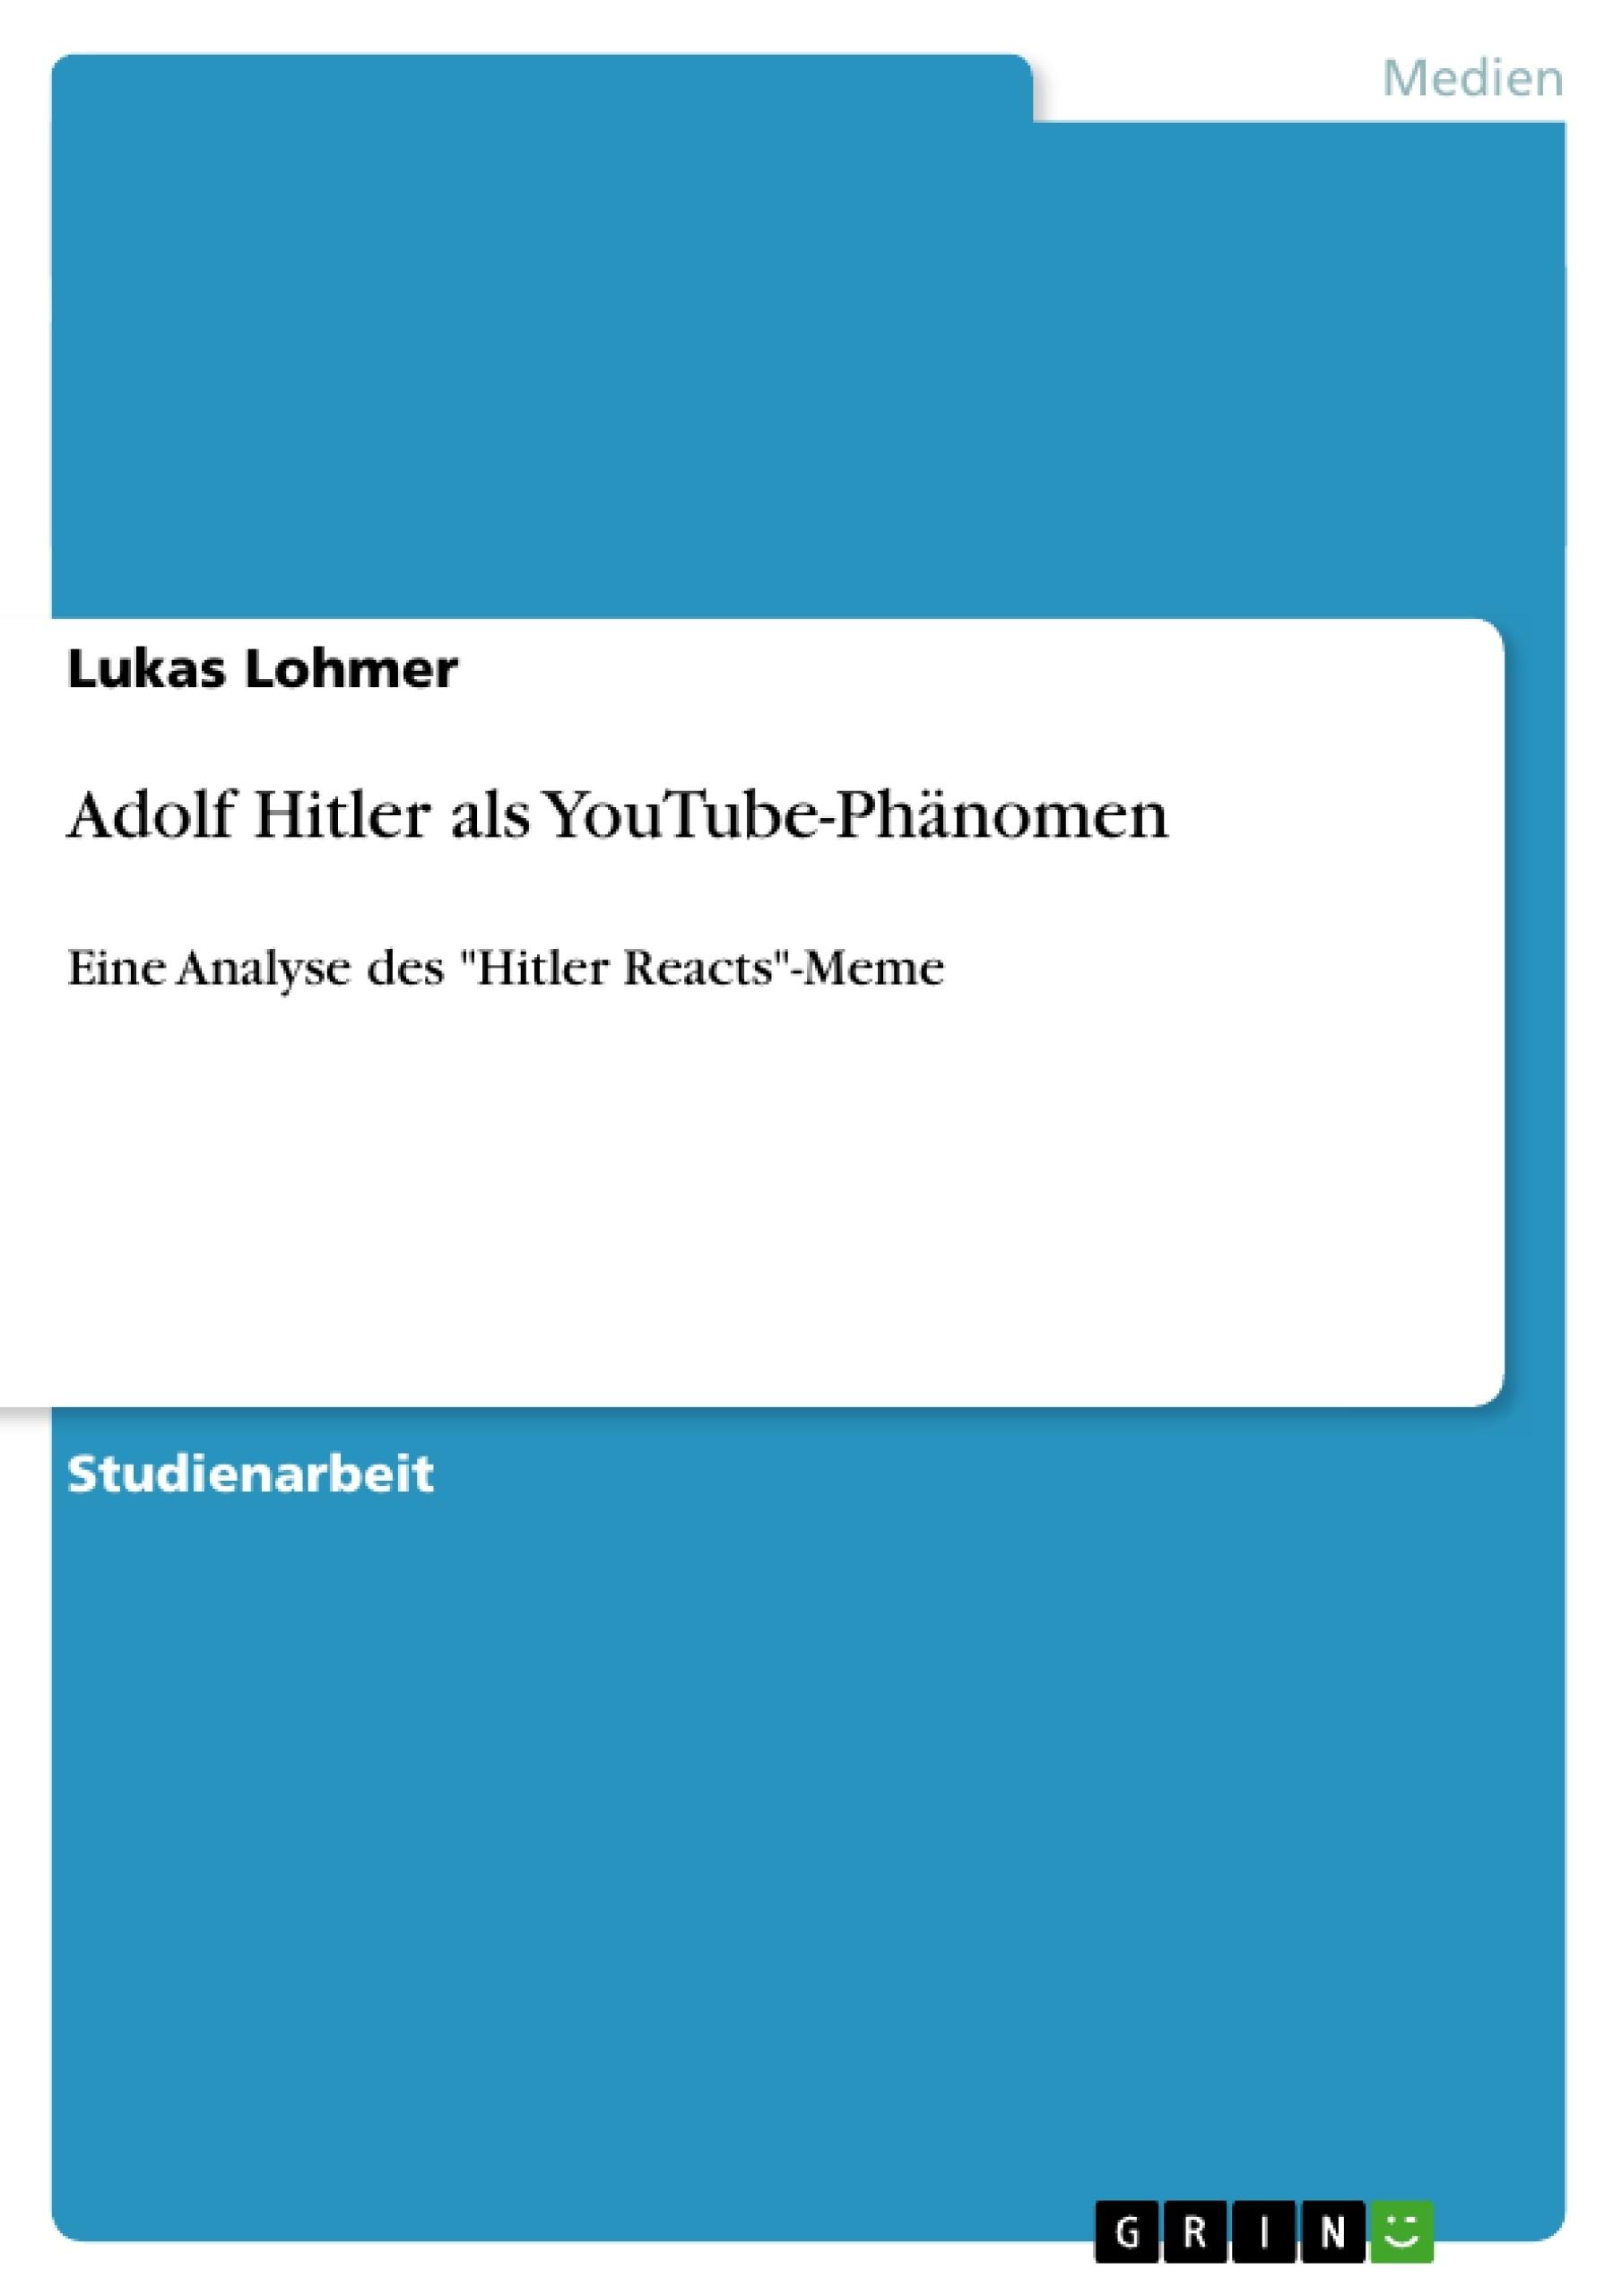 Titel: Adolf Hitler als YouTube-Phänomen